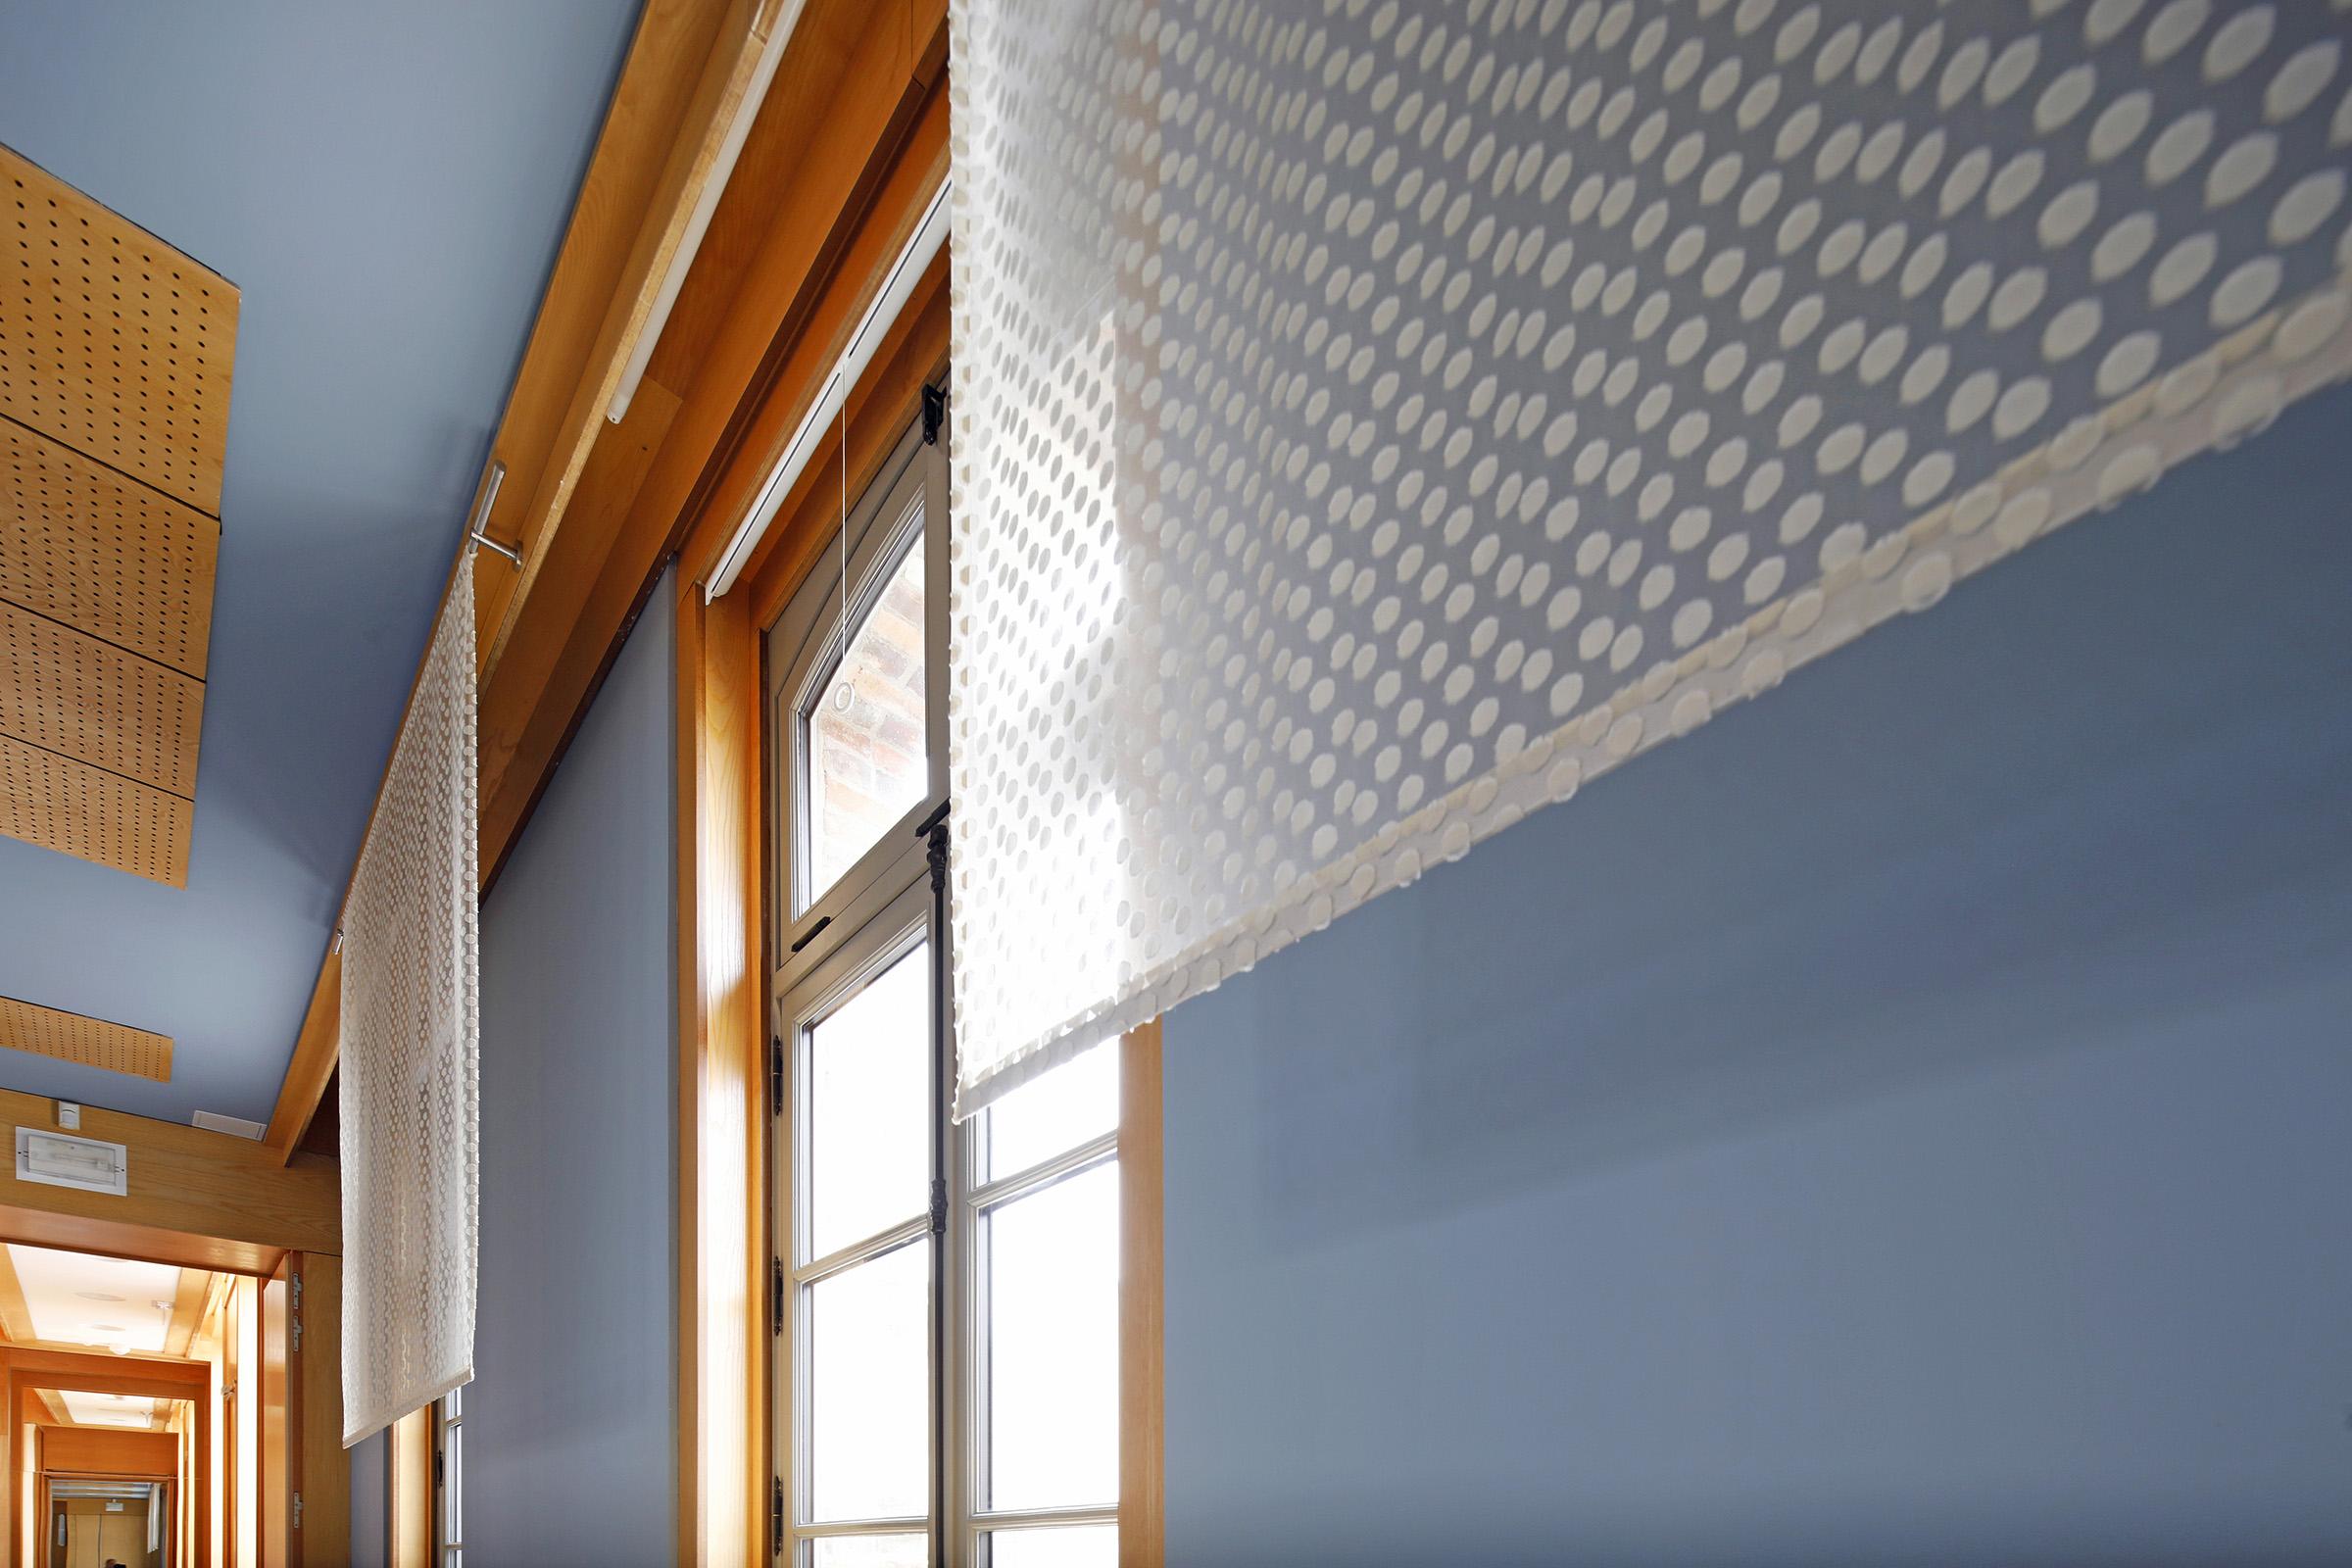 Amilly - La Maison Saint Loup - Interieur - Sylvain Dubuisson 025.jpg